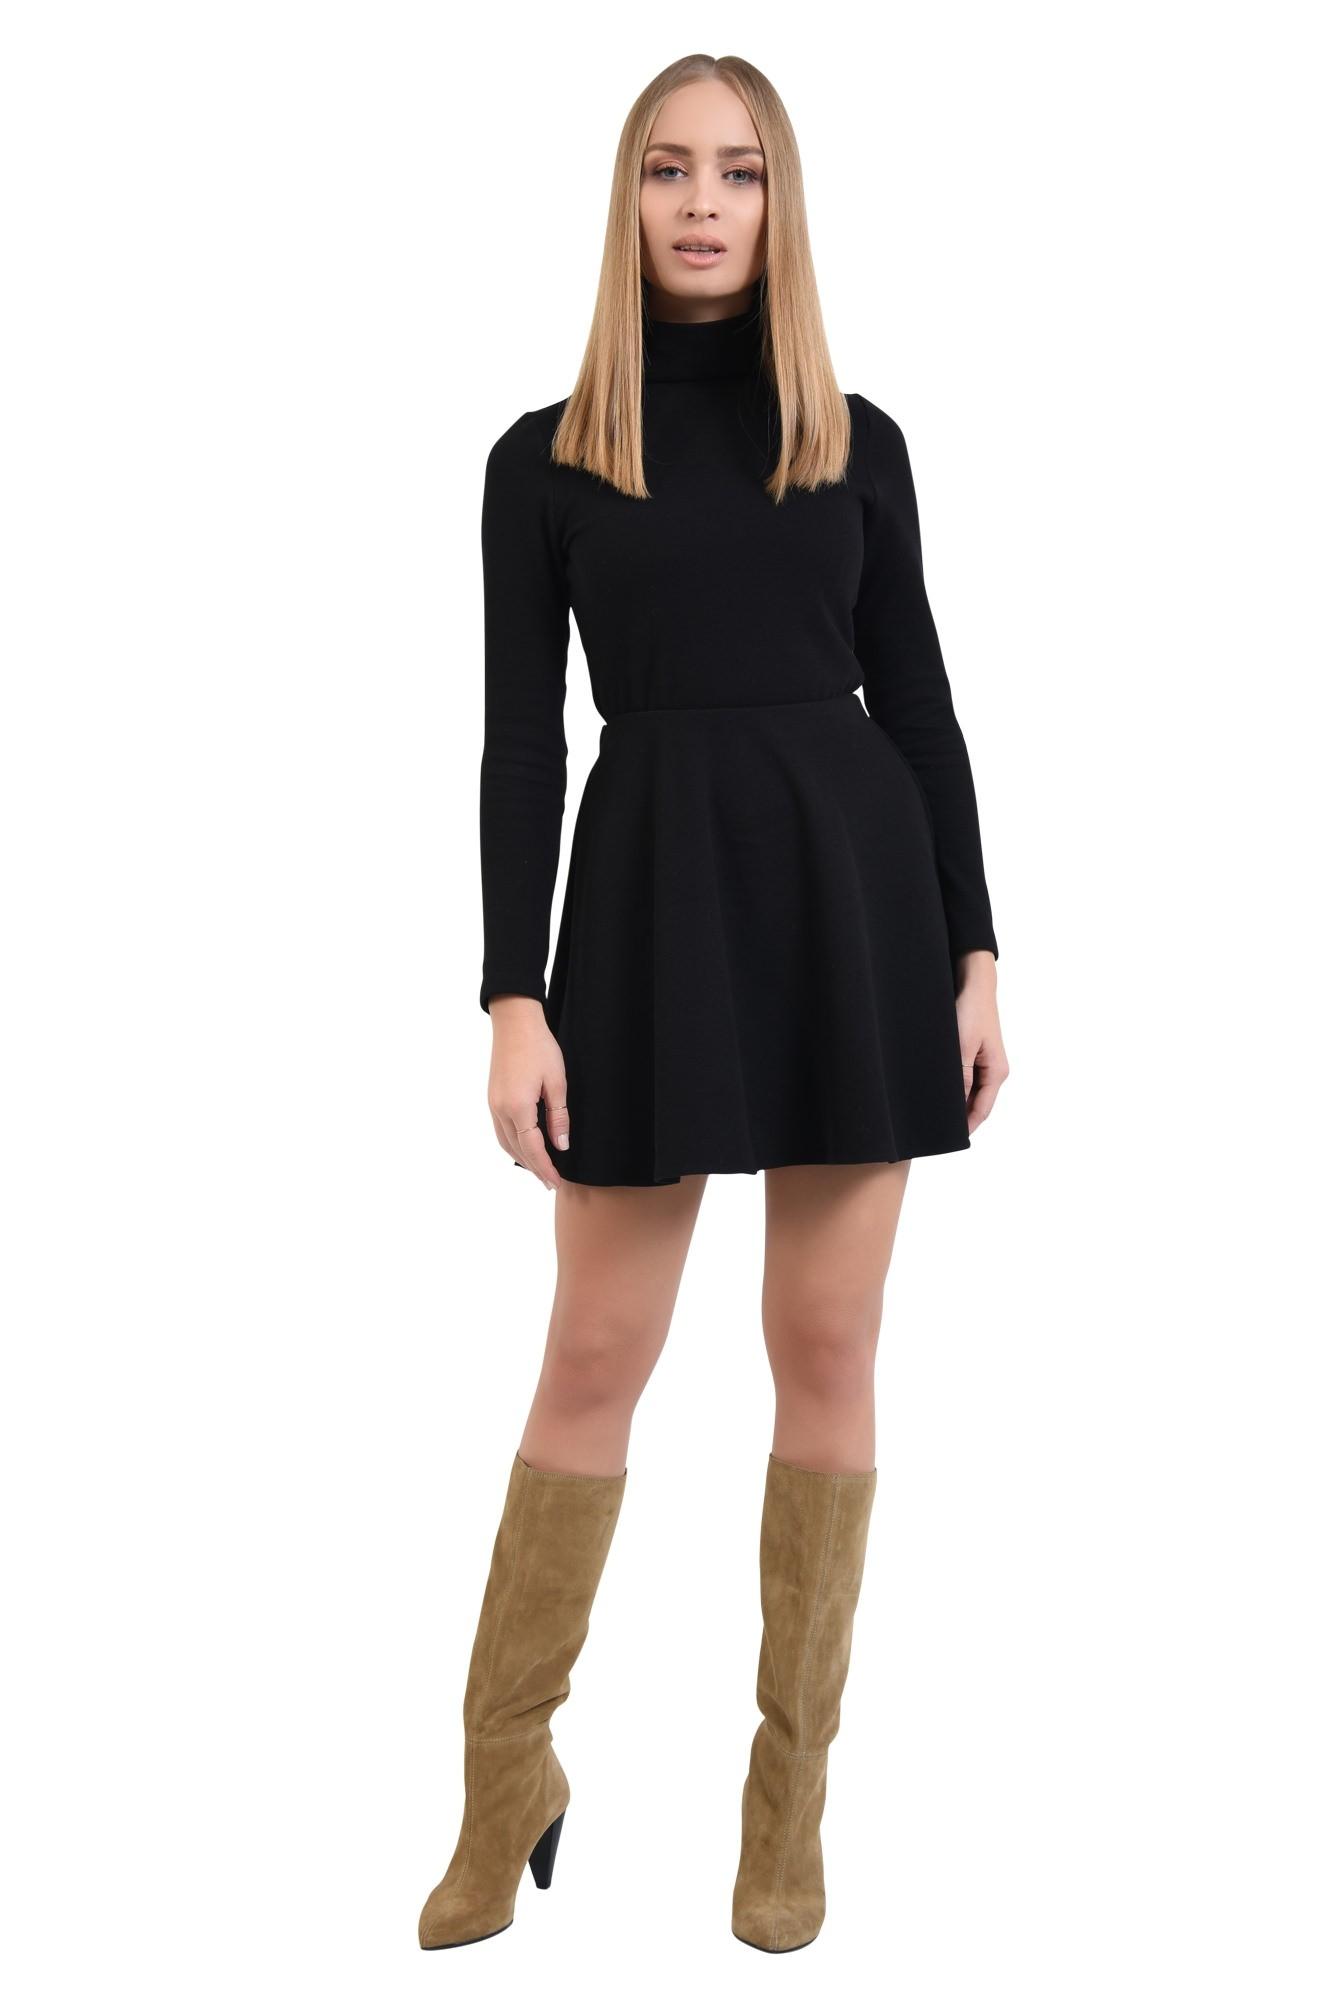 fusta scurta, neagra, tricotata, croi evazat